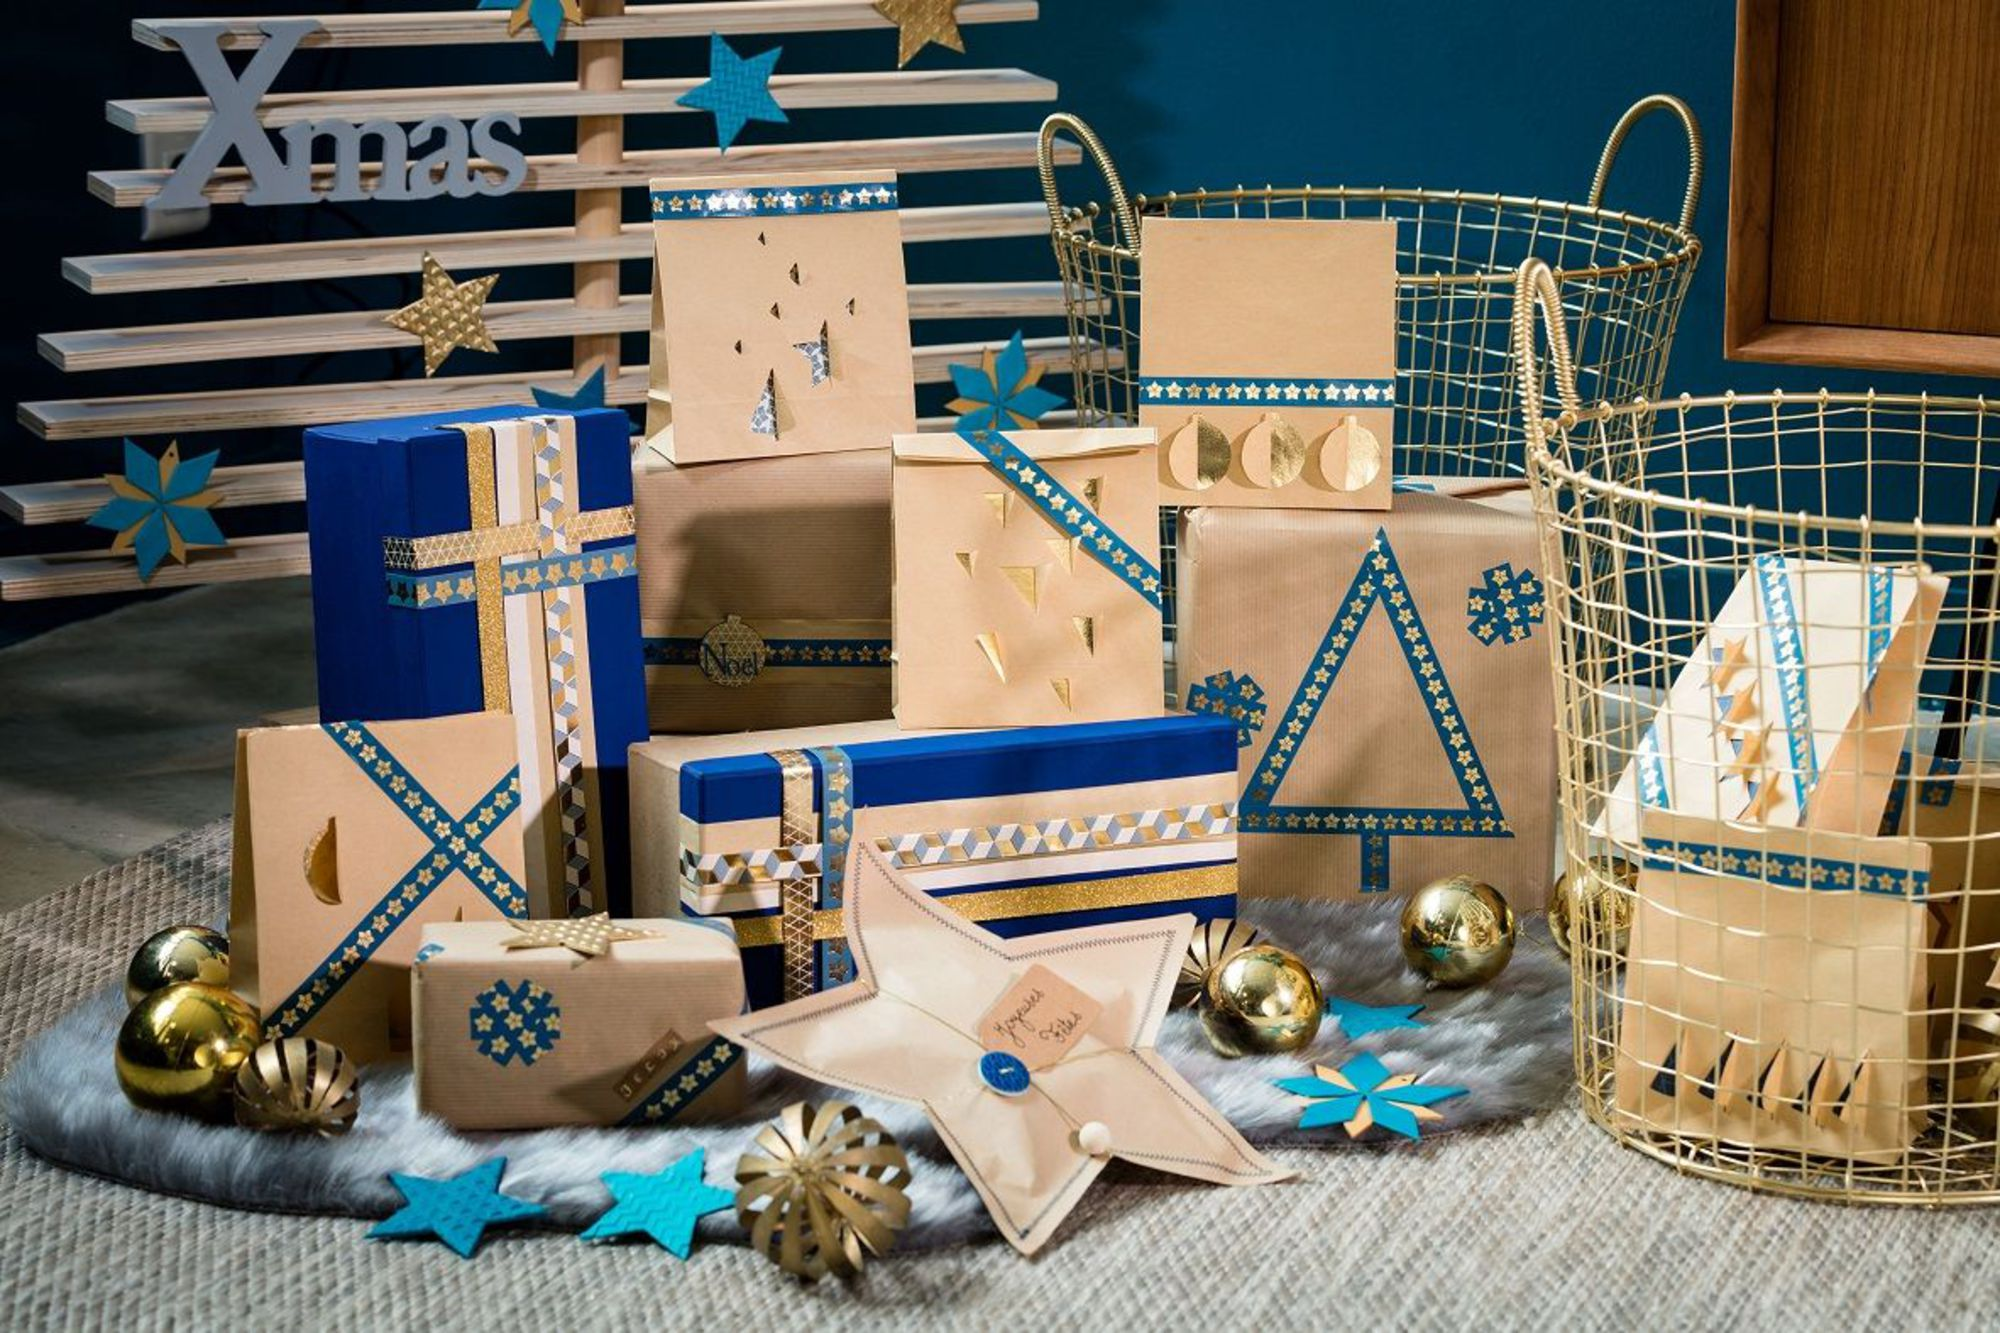 deco-de-noel-diy-paquet-cadeaux-faits-main_5725401